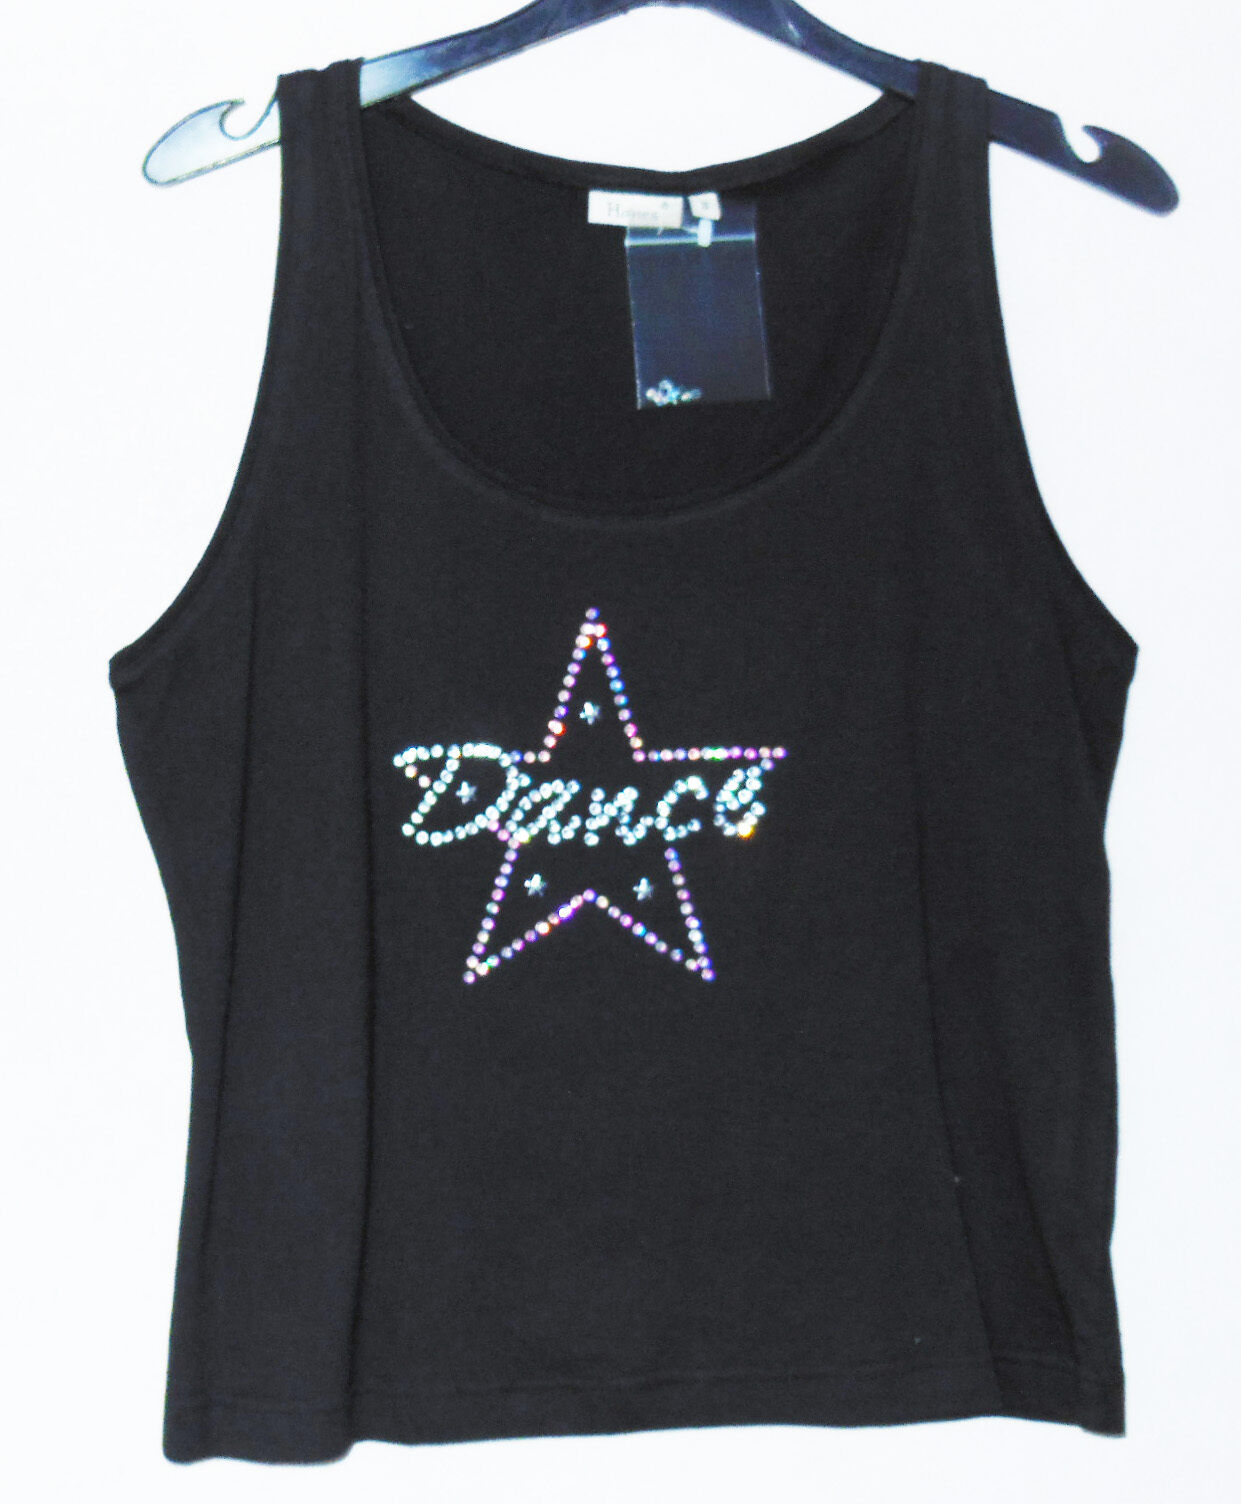 New Glitzy Dance Vest Tops - Ladies 8-10 & 12-14